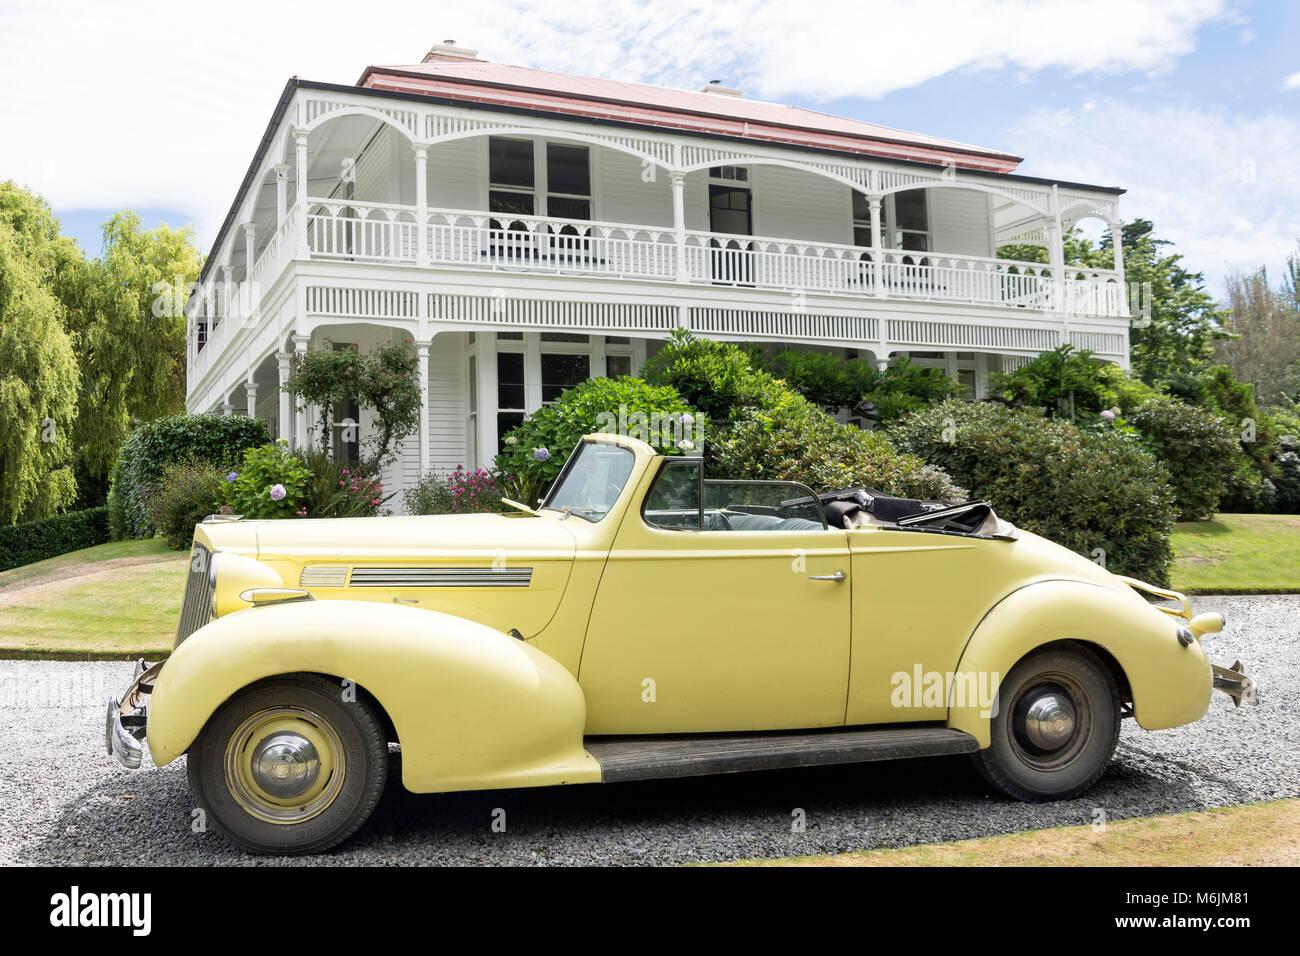 1939 Packard convertible sedan, Homesdale House, Rakaia, Canterbury, Nueva Zelanda Imagen De Stock